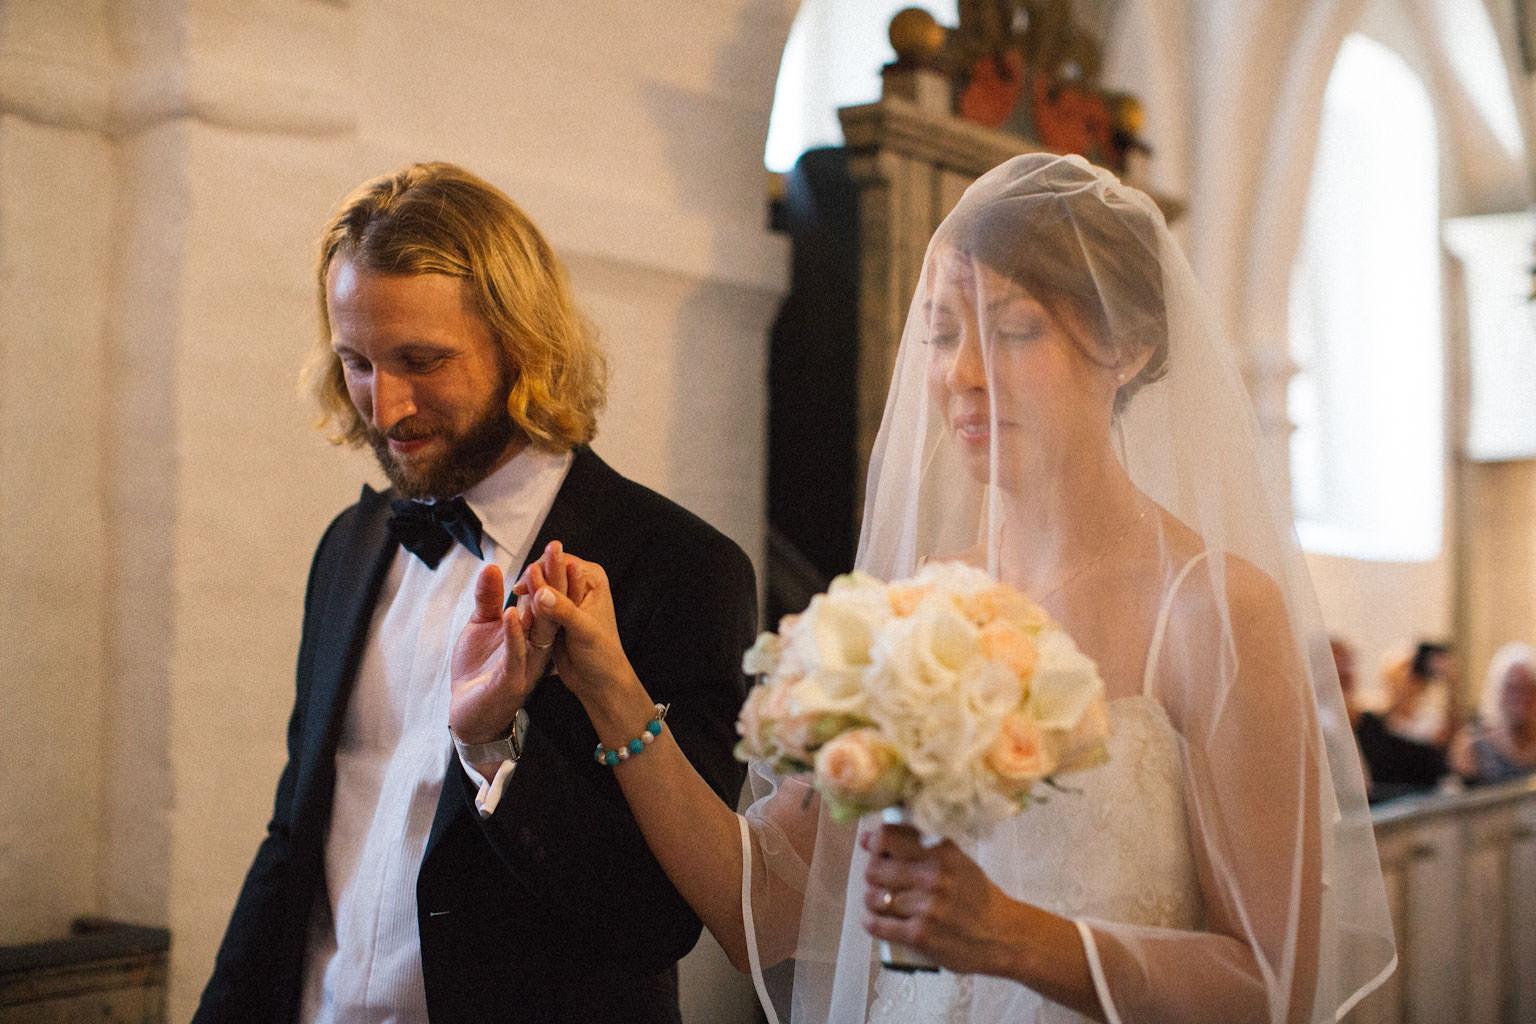 Vigsel i Hannas kyrka, medeltidskyrka i Skåne. Foto: Tove Lundquist, verksam bröllopsfotograf Skåne.